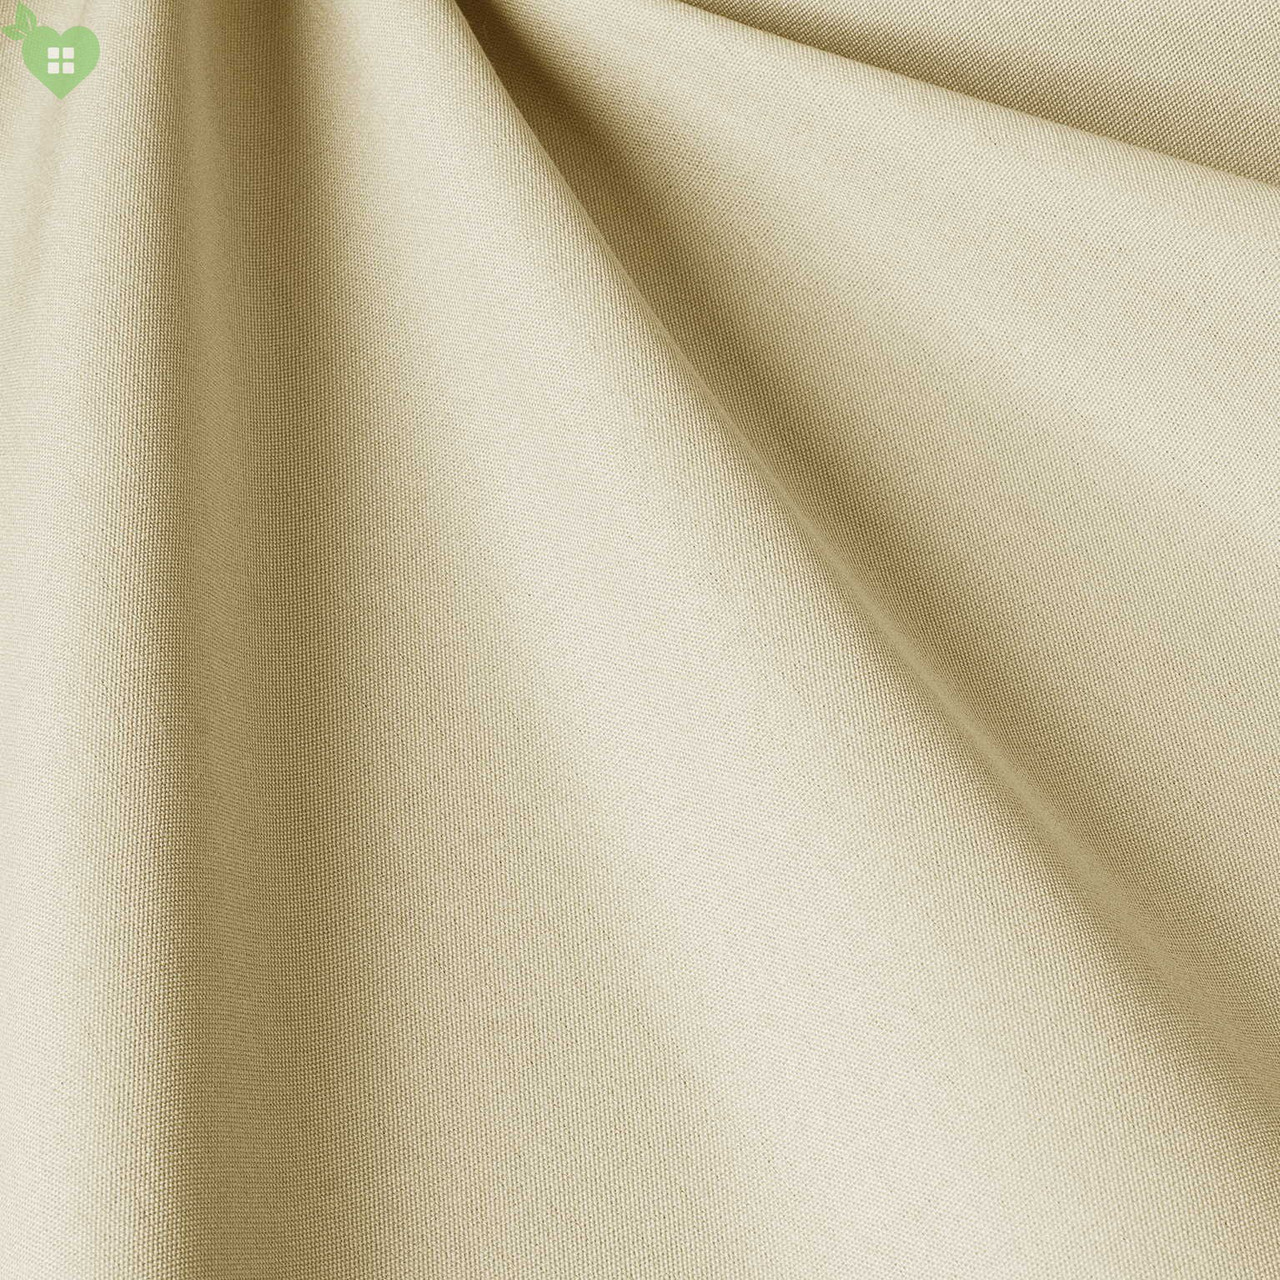 Ткань для улицы: Дралон (Outdoor) 400333v10